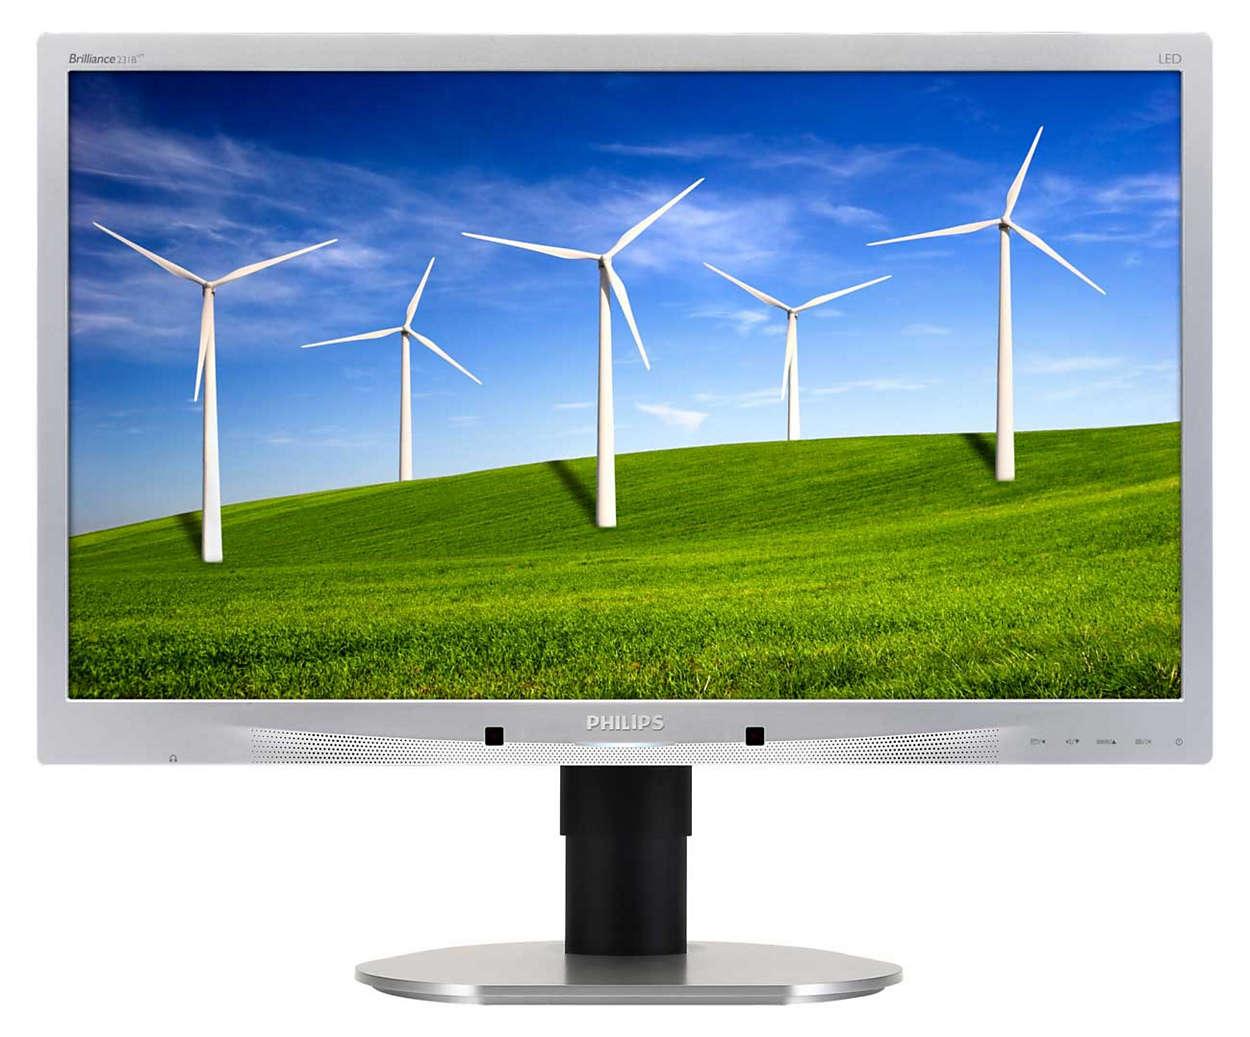 Sustainable eco design display